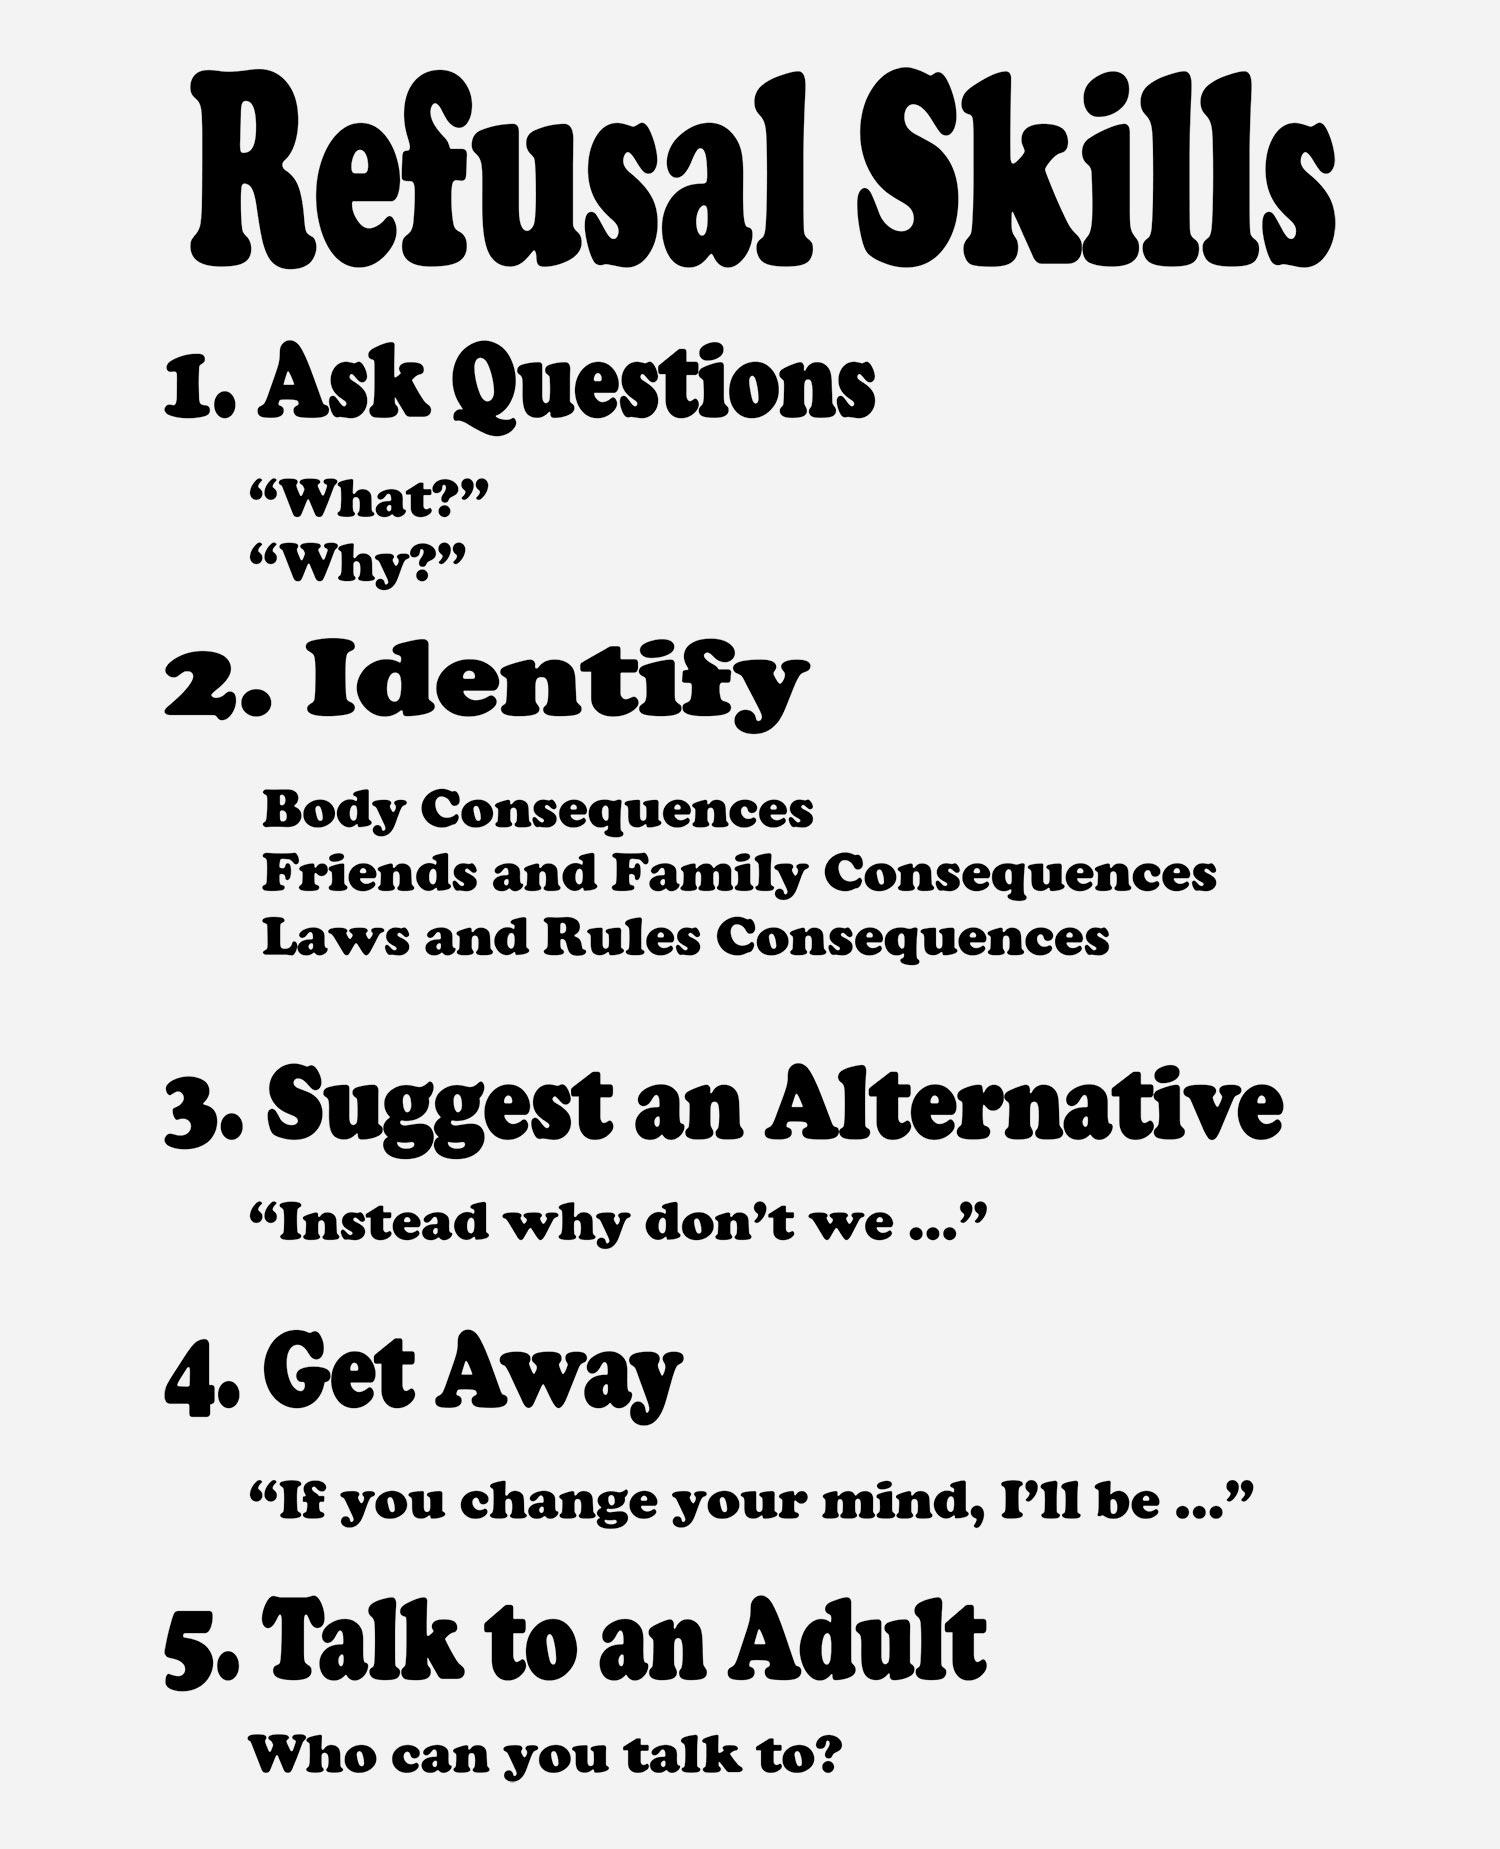 Refusal Skills Poster-1